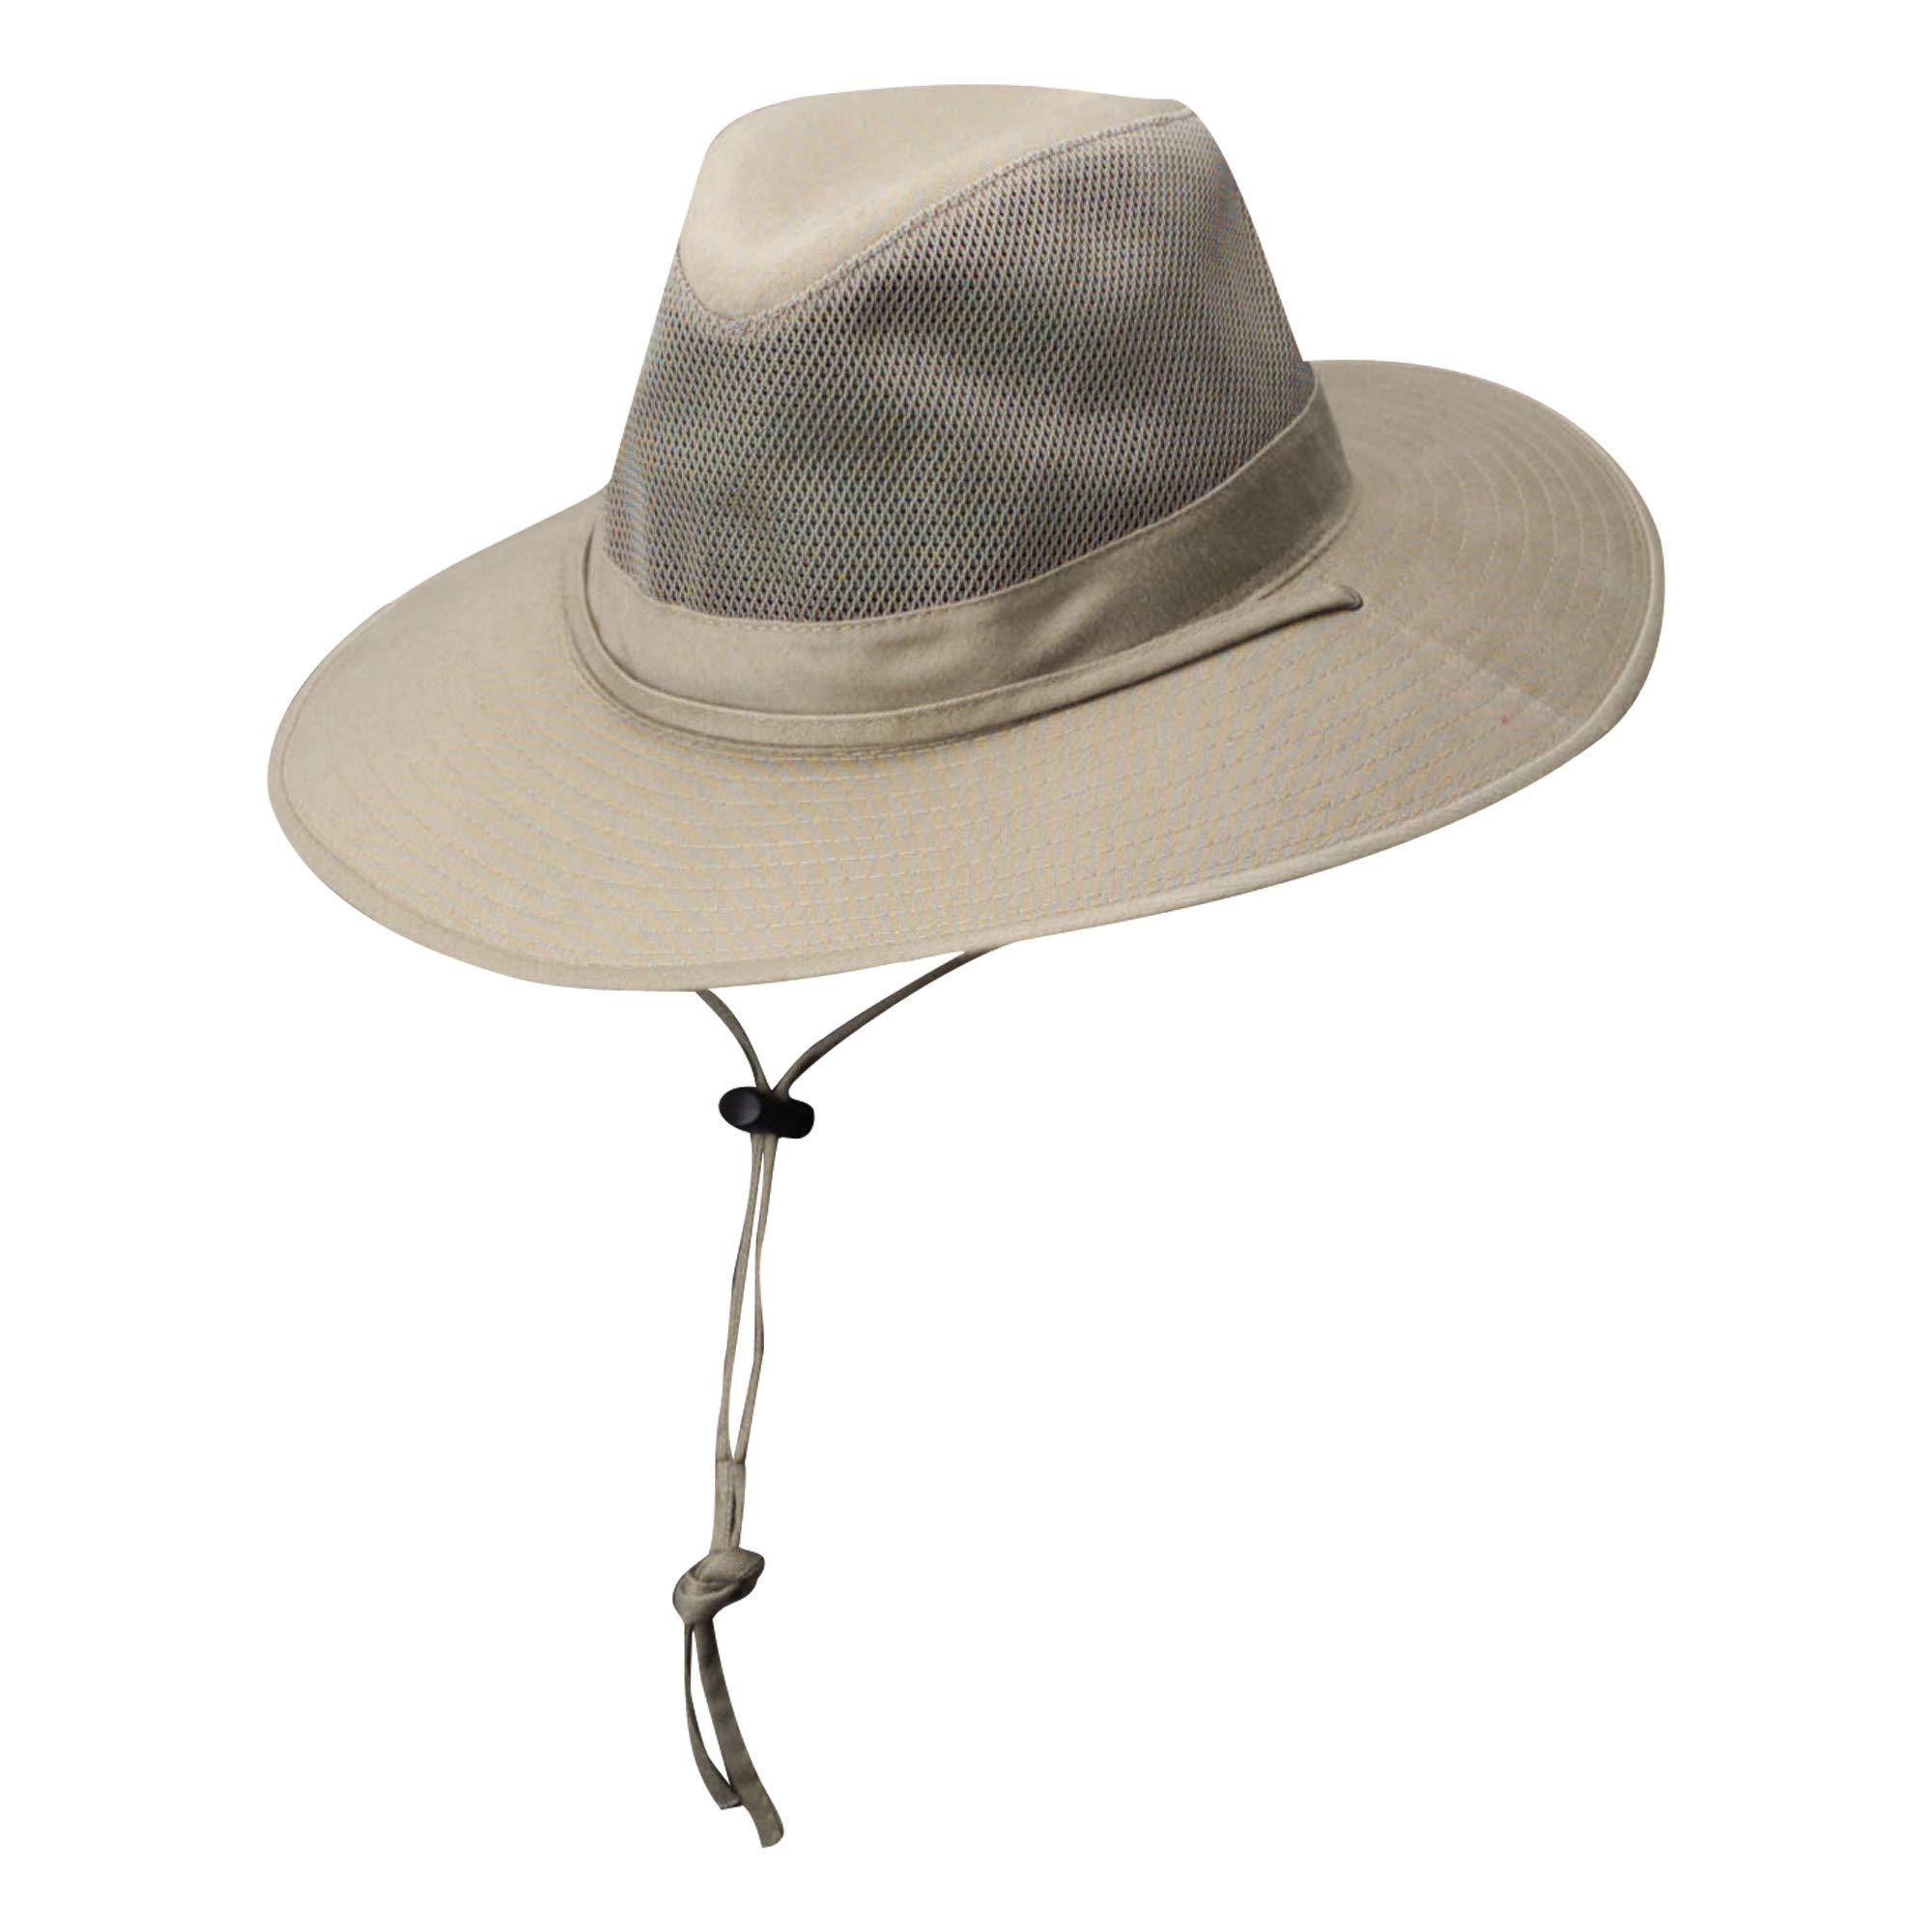 85763336 Best Rated in Men's Sun Hats & Helpful Customer Reviews - Amazon.com